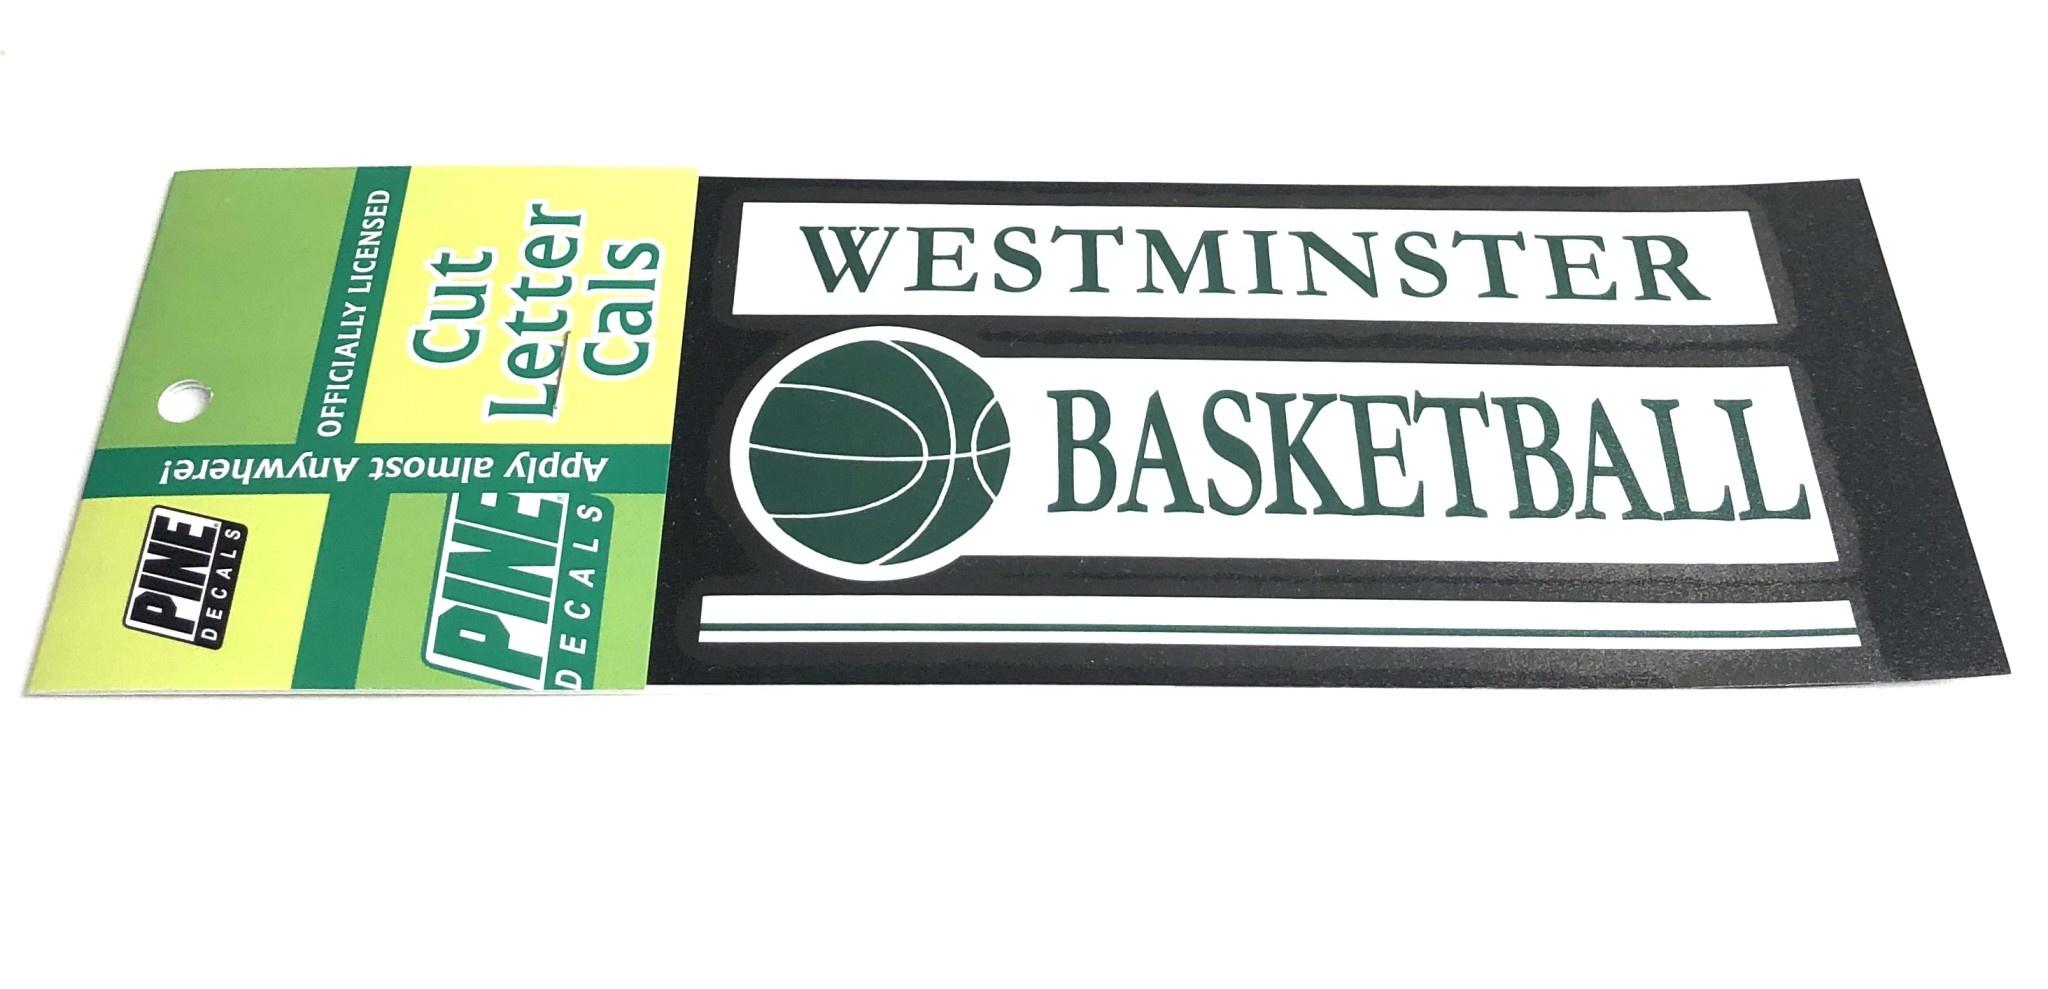 Bumper Stickers - Sports Part 1